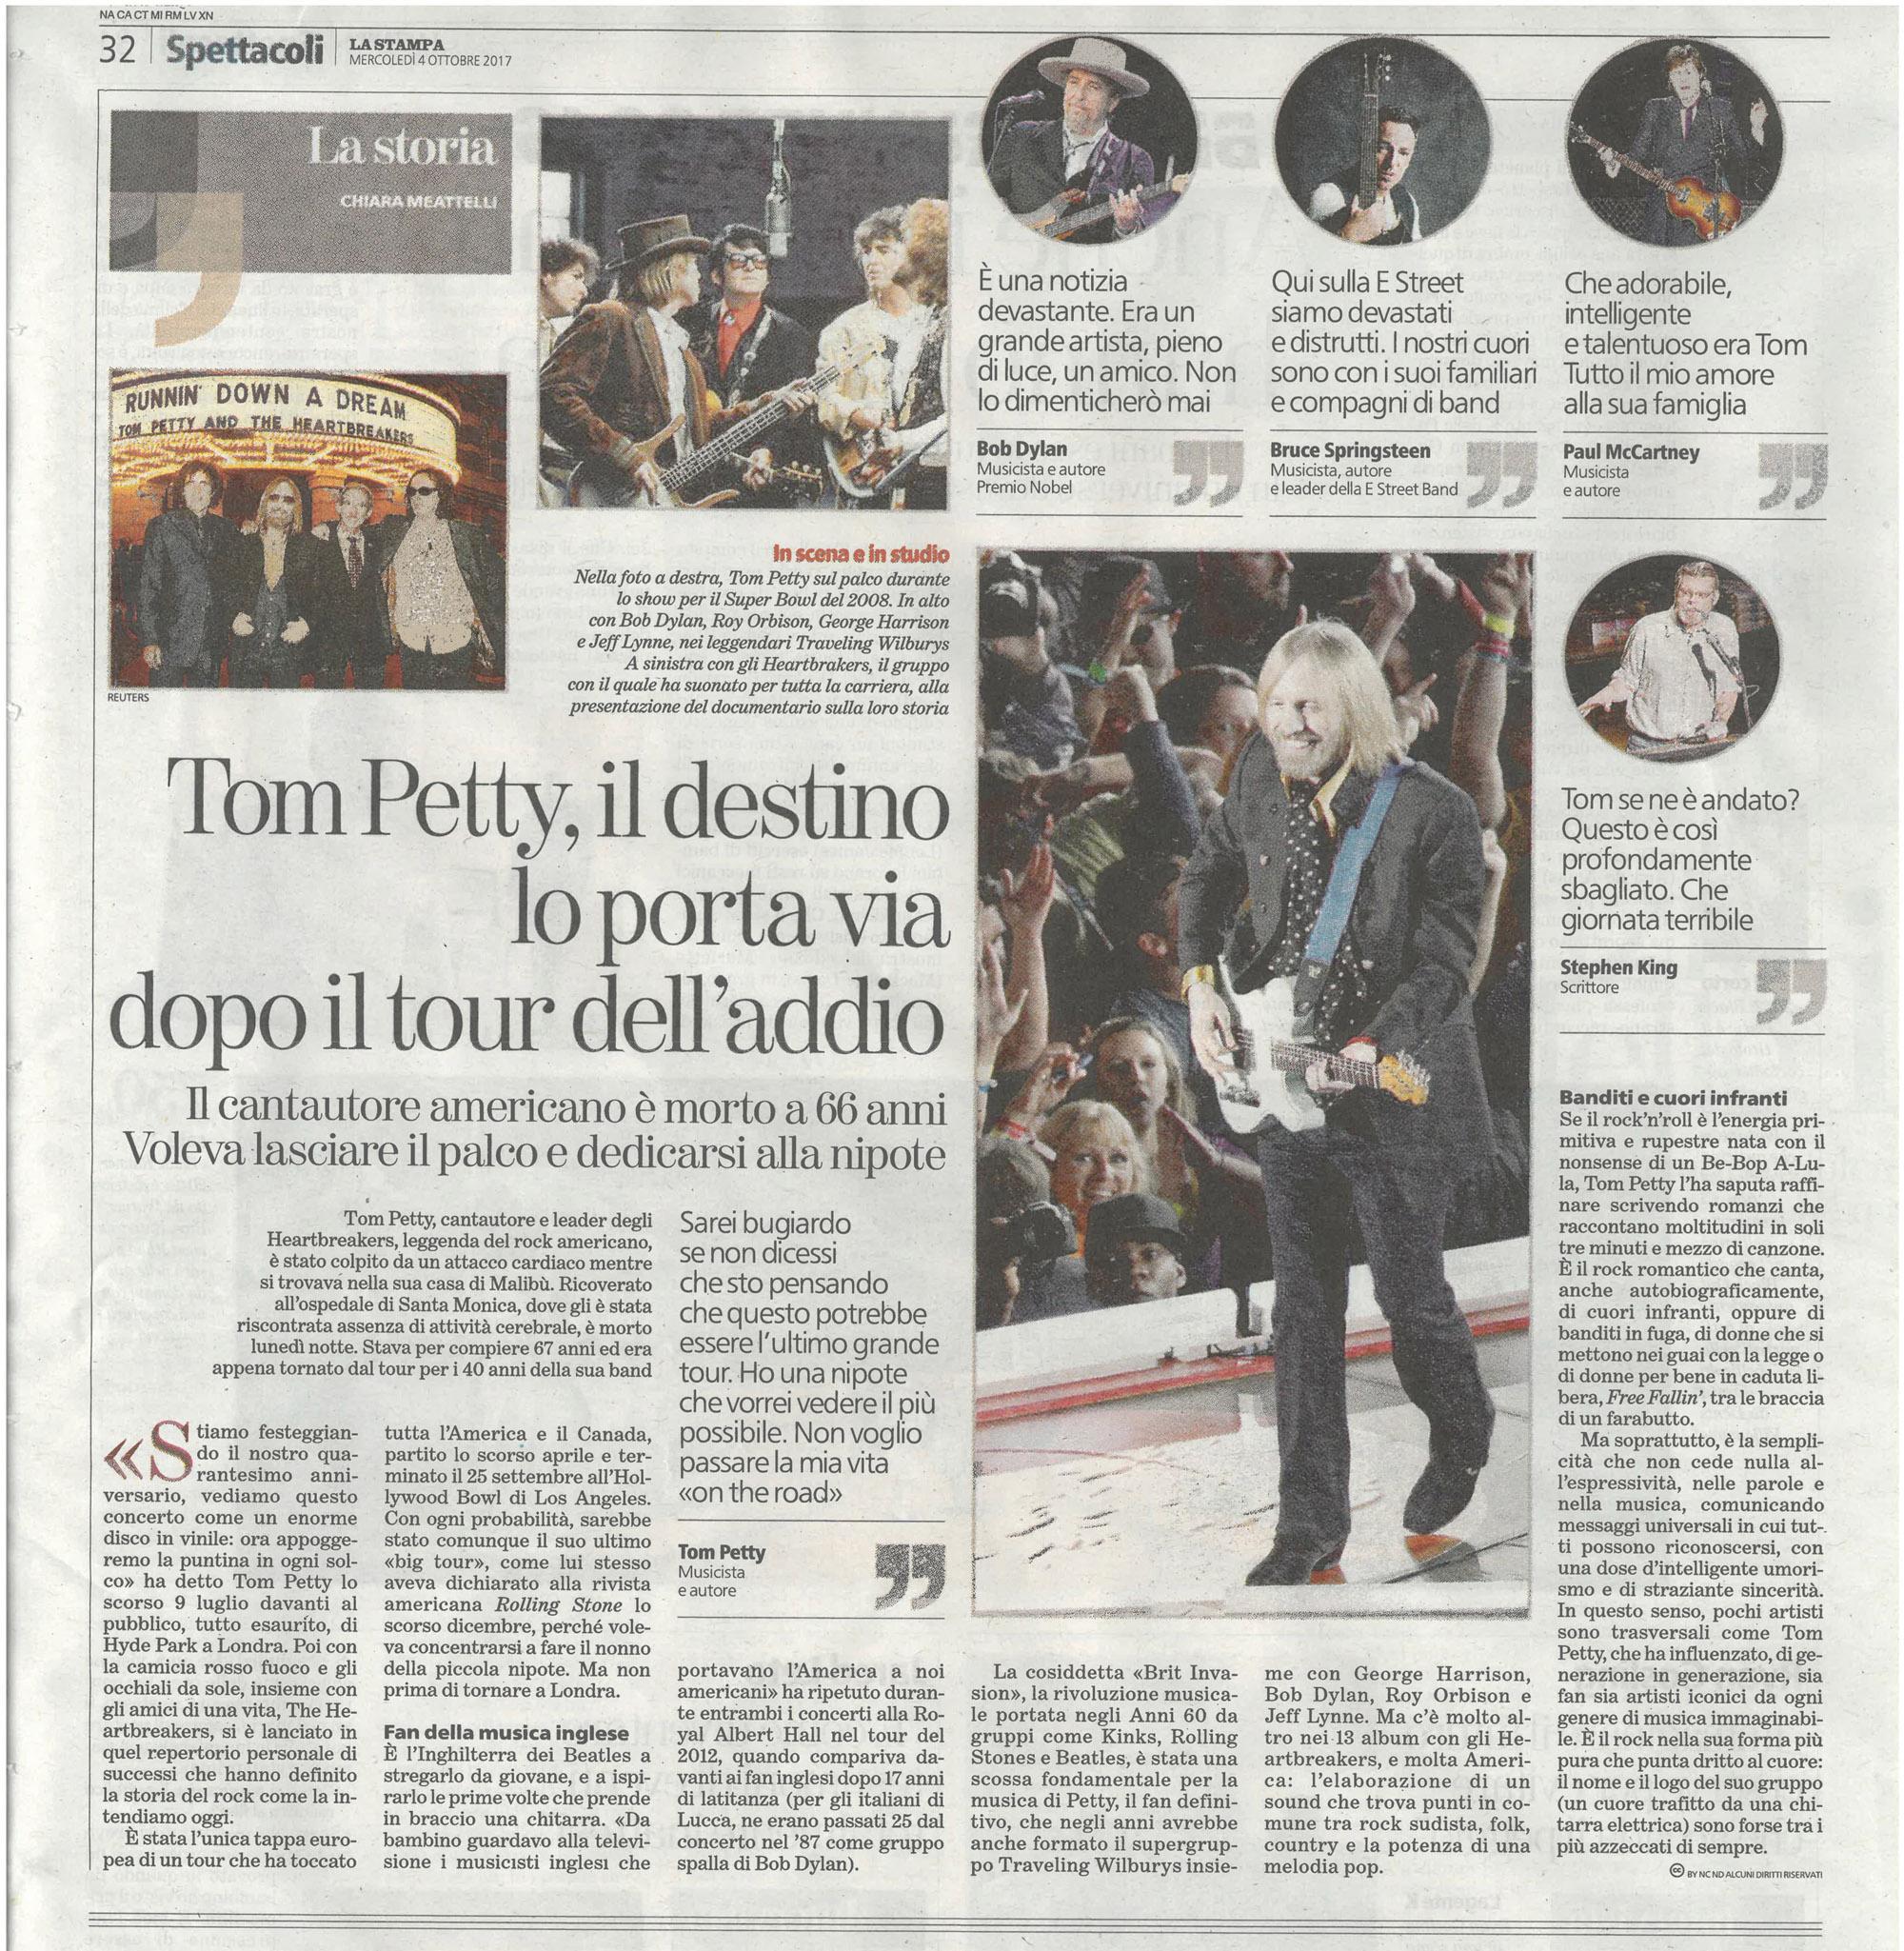 La Stampa: Tom Petty